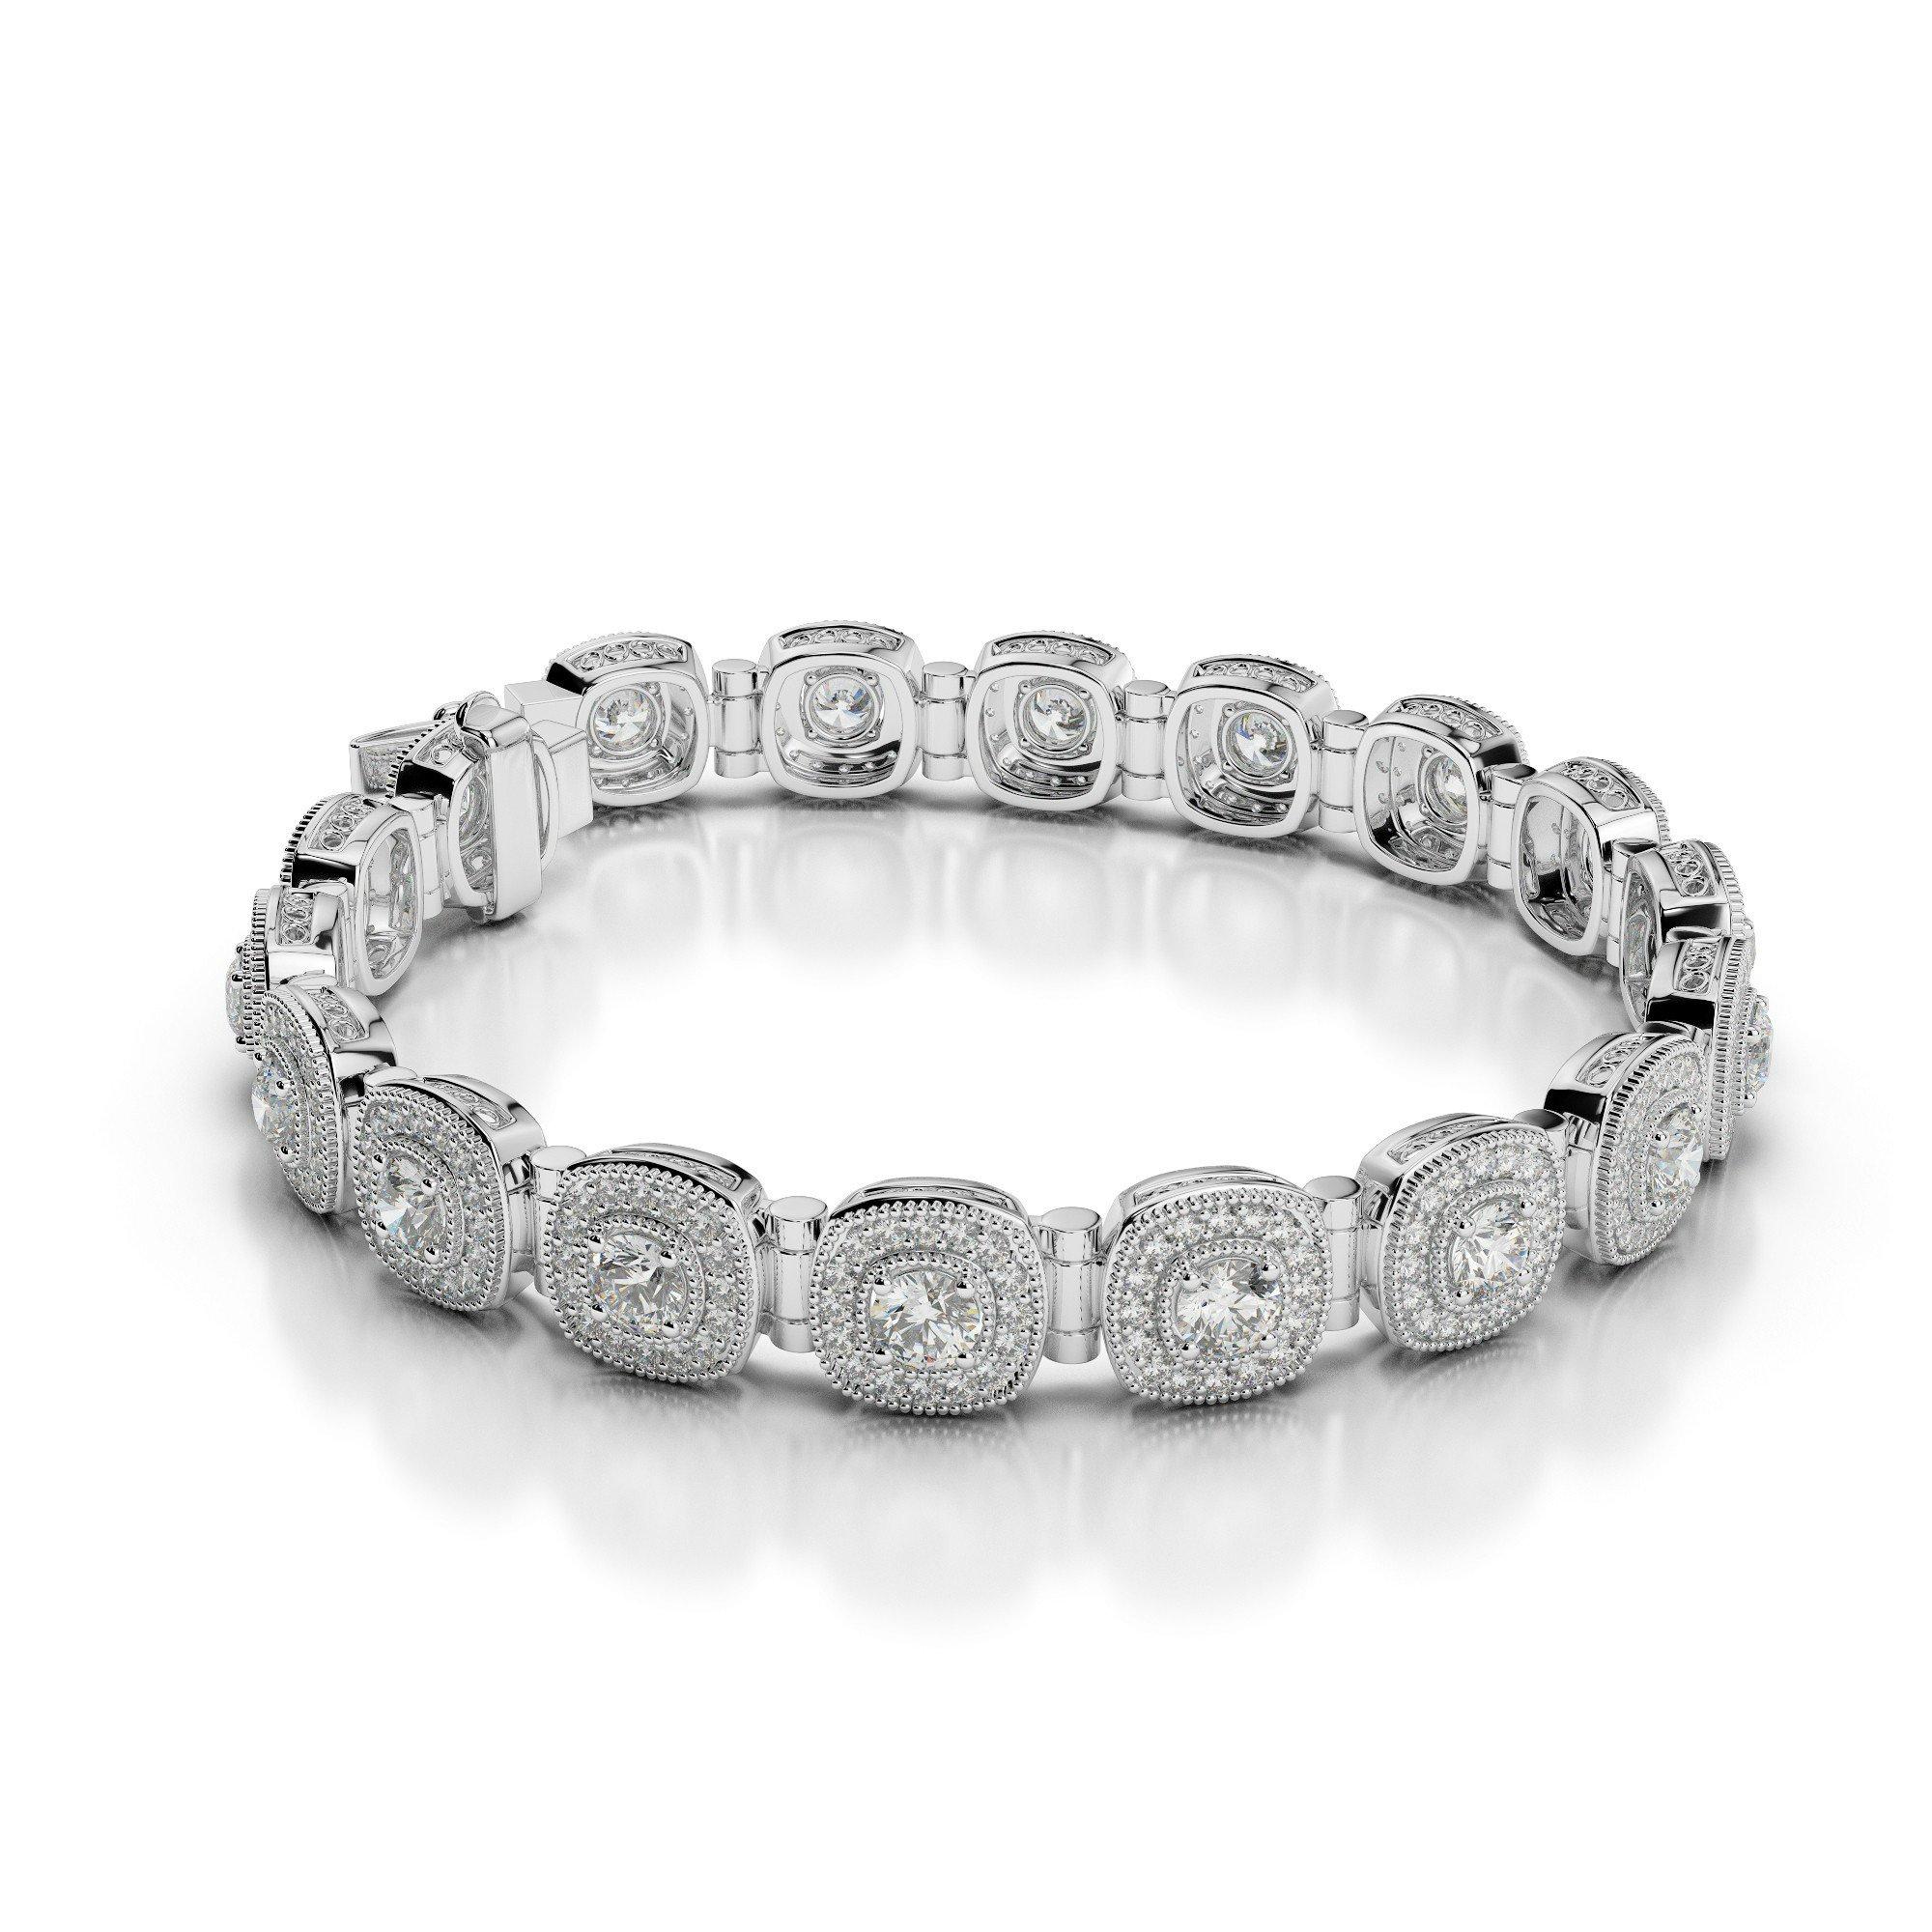 4.80 Carat Diamond Halo Bracelet